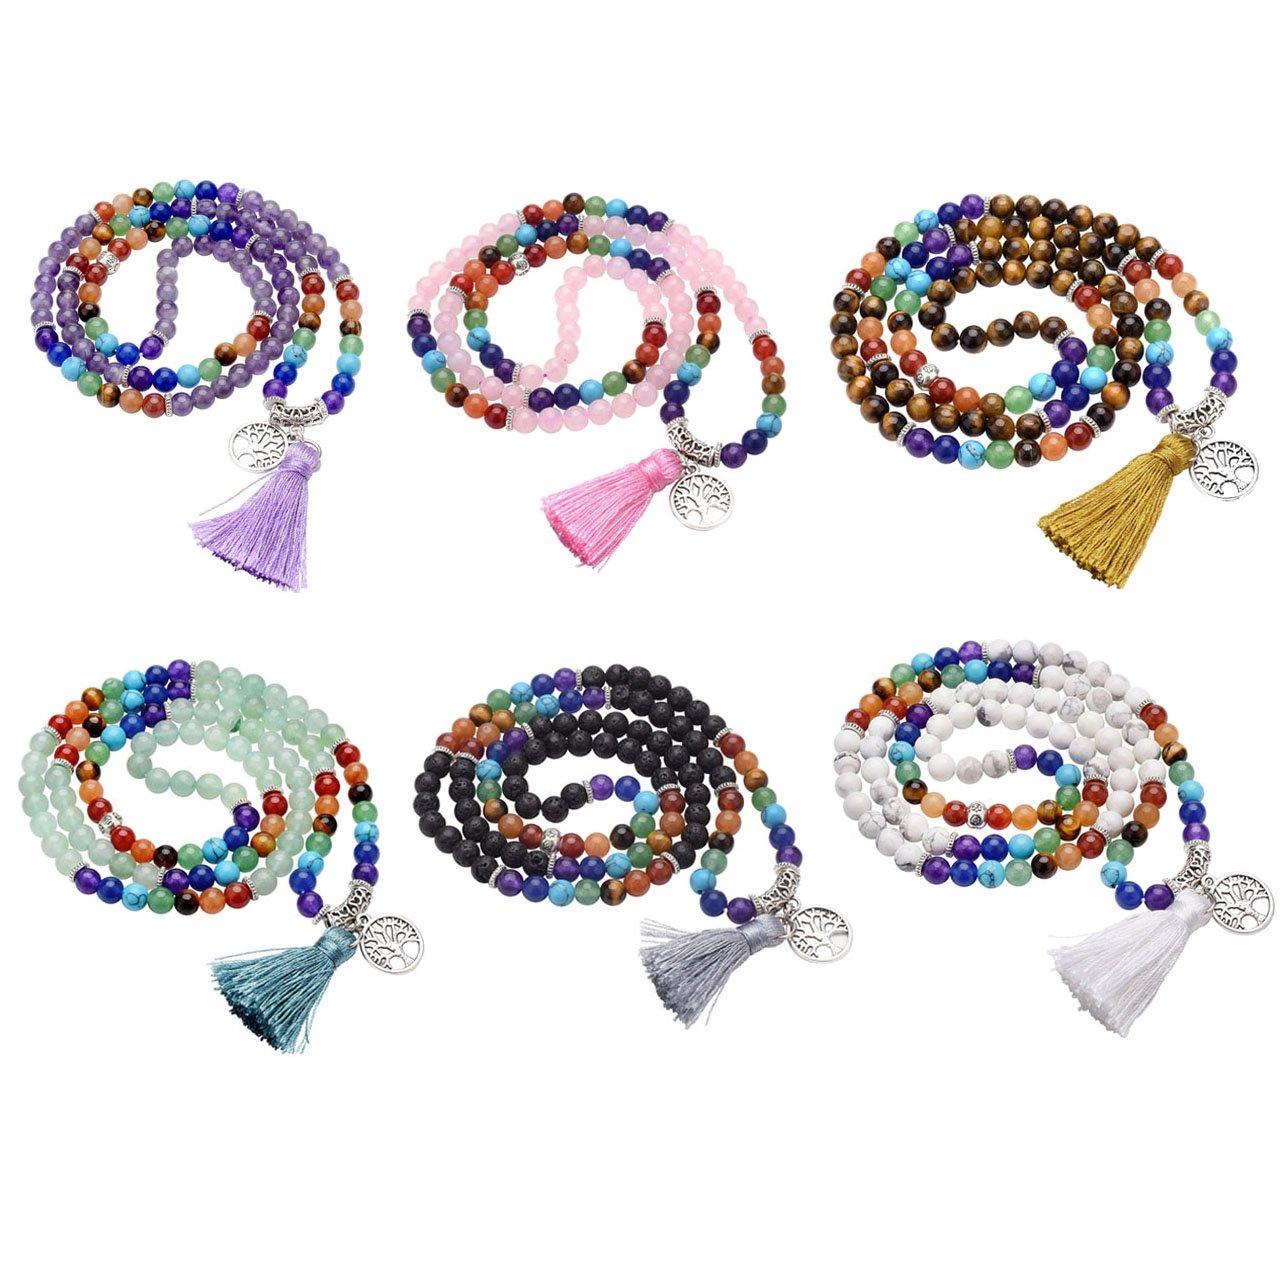 Jovivi 6mm Natural 7 Chakra Healing Crystal Gemstone Buddhist Prayer 108 Beads Tibetan Mala Bracelet Necklace